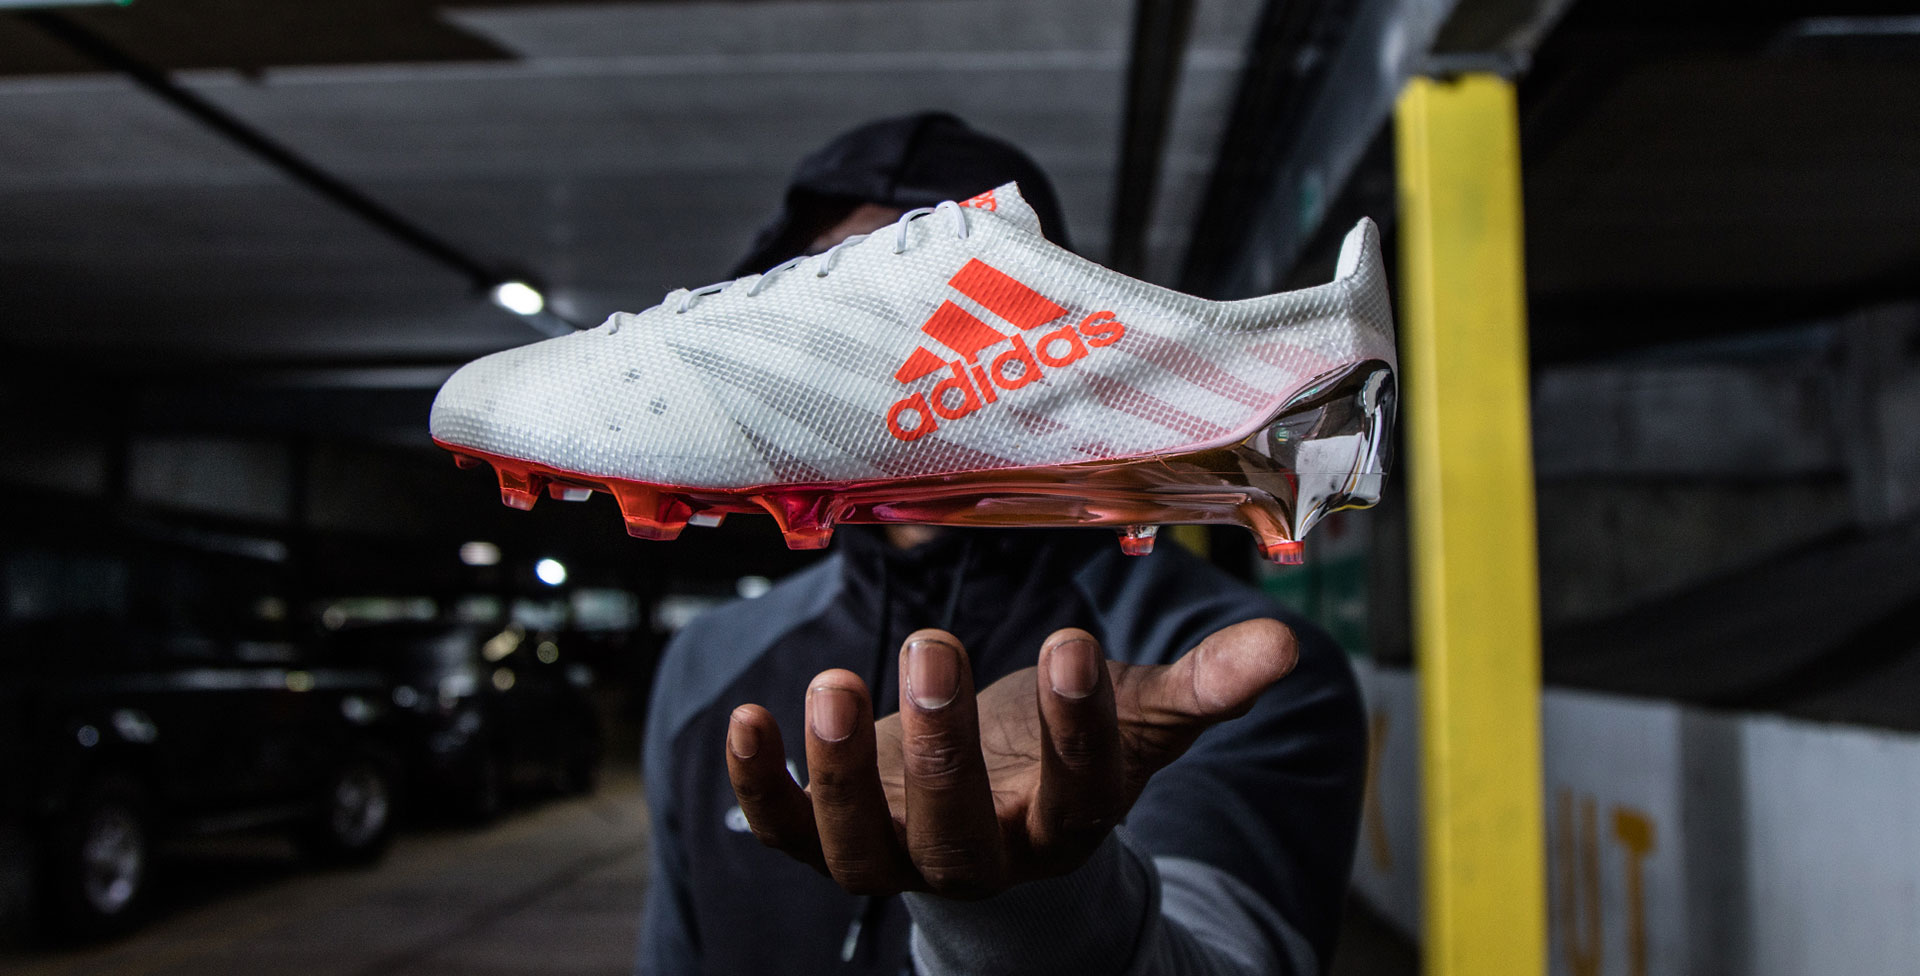 adidas Adizero de 99g : 299 paires en collection ultra